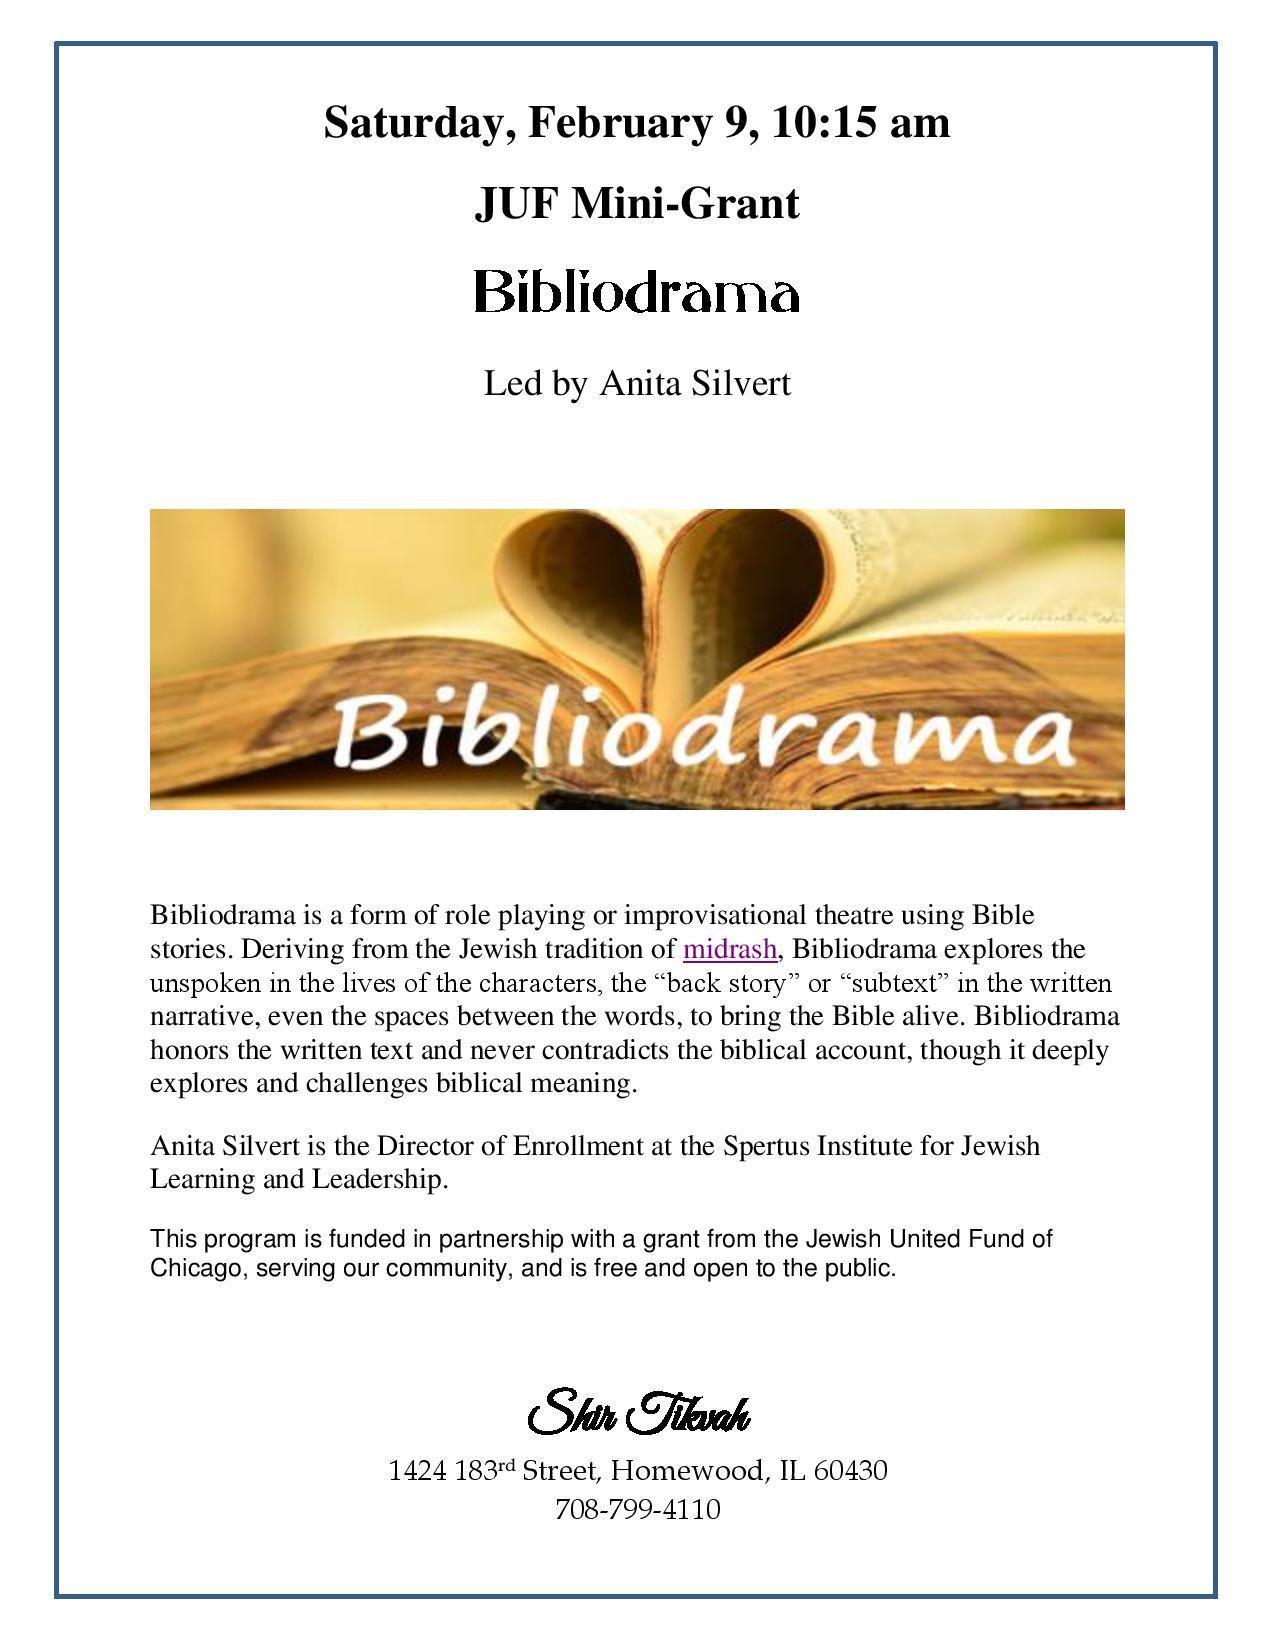 Anita Silvert - Bibliodrama-page-001